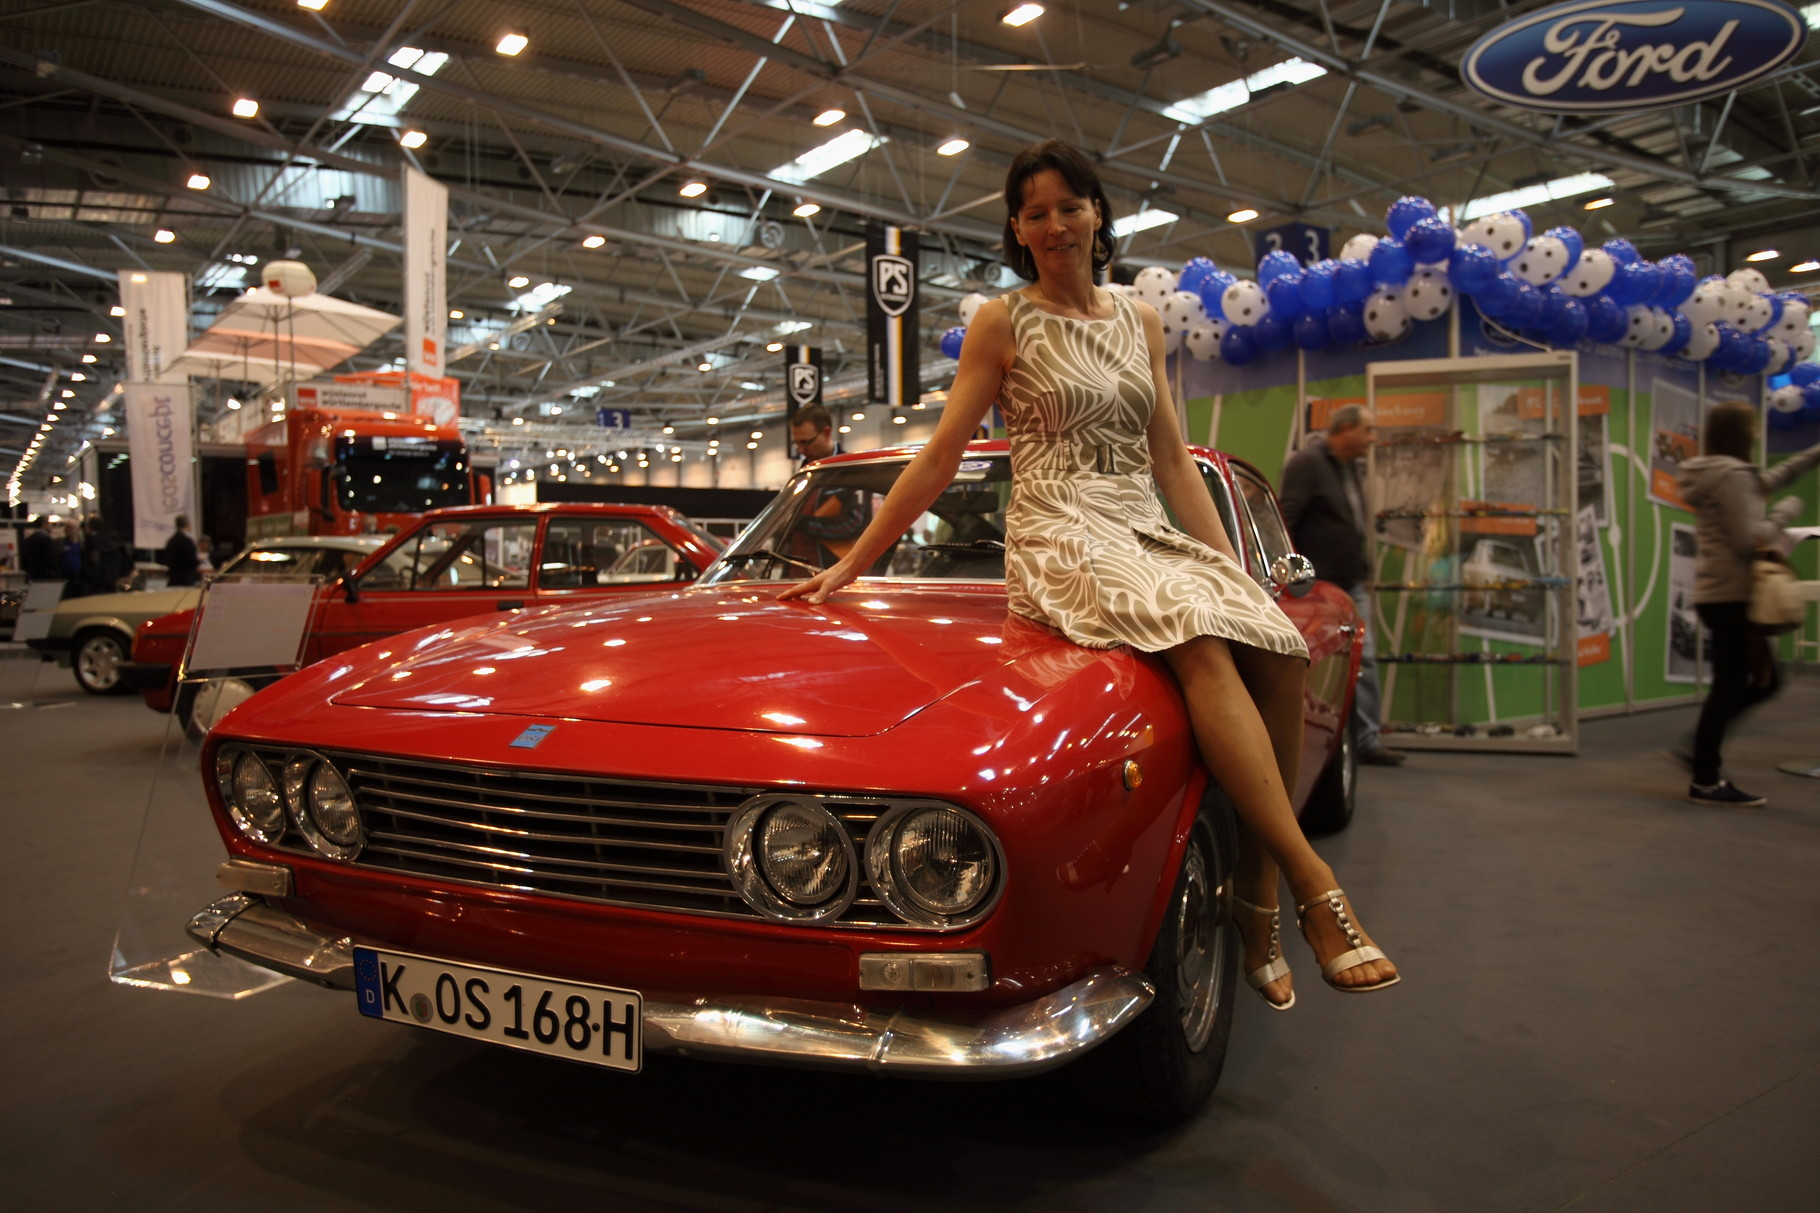 Techno Classica 2012 in Essen auf dem Ford-Stand